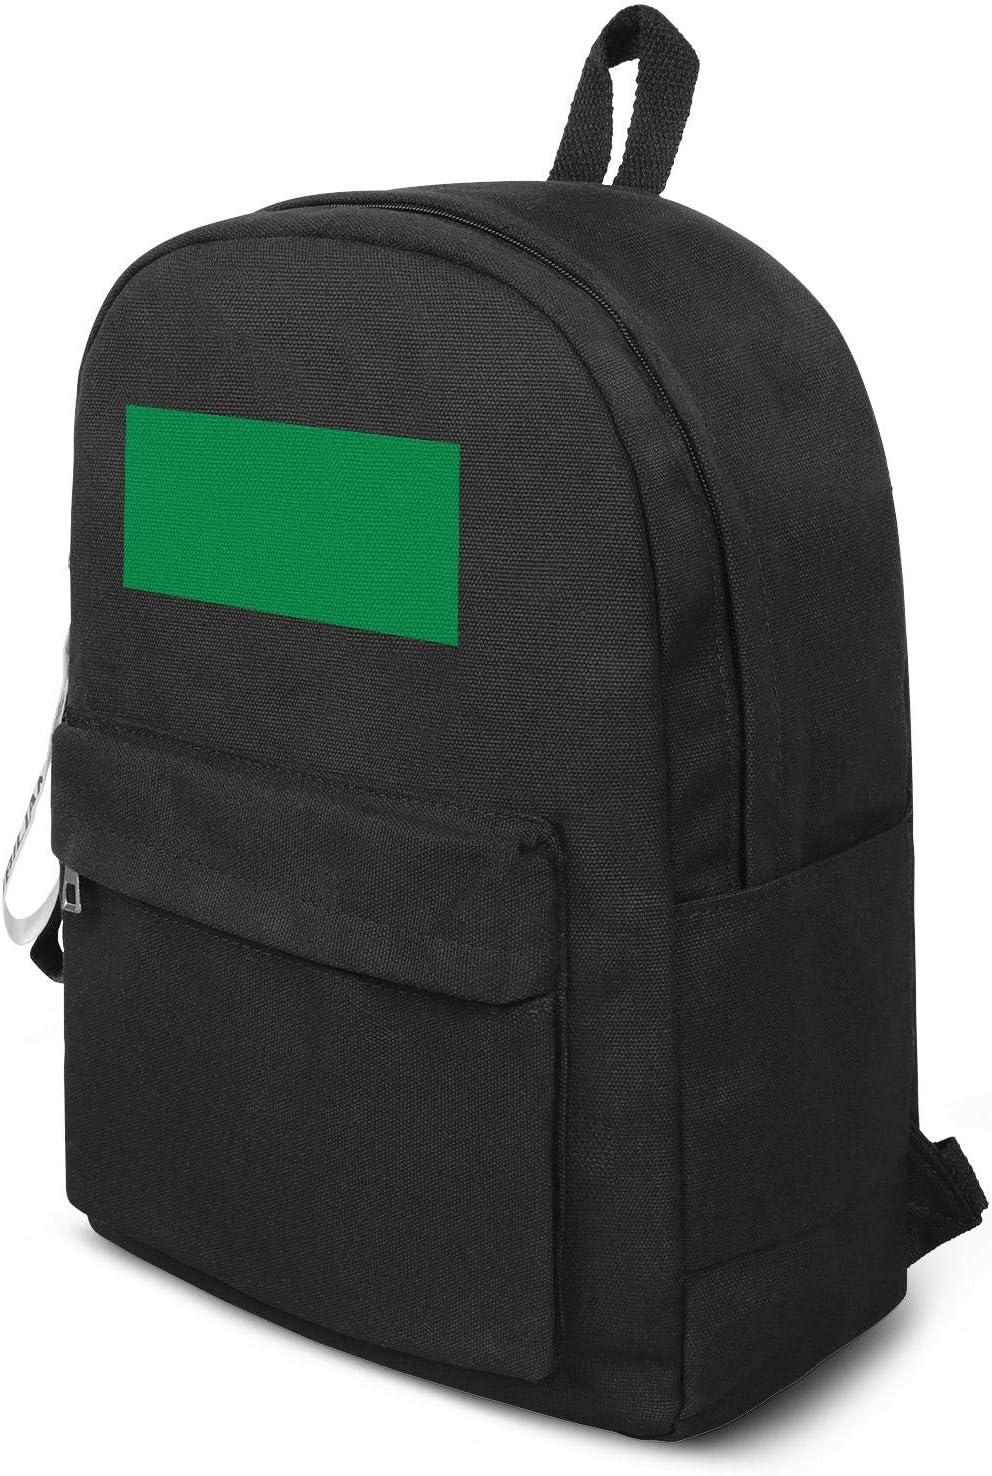 Travel Laptop Backpack Libyan Arab Jamahiriya Flag Emblem College Rucksack for Travel Outdoor Camping Computer Bag